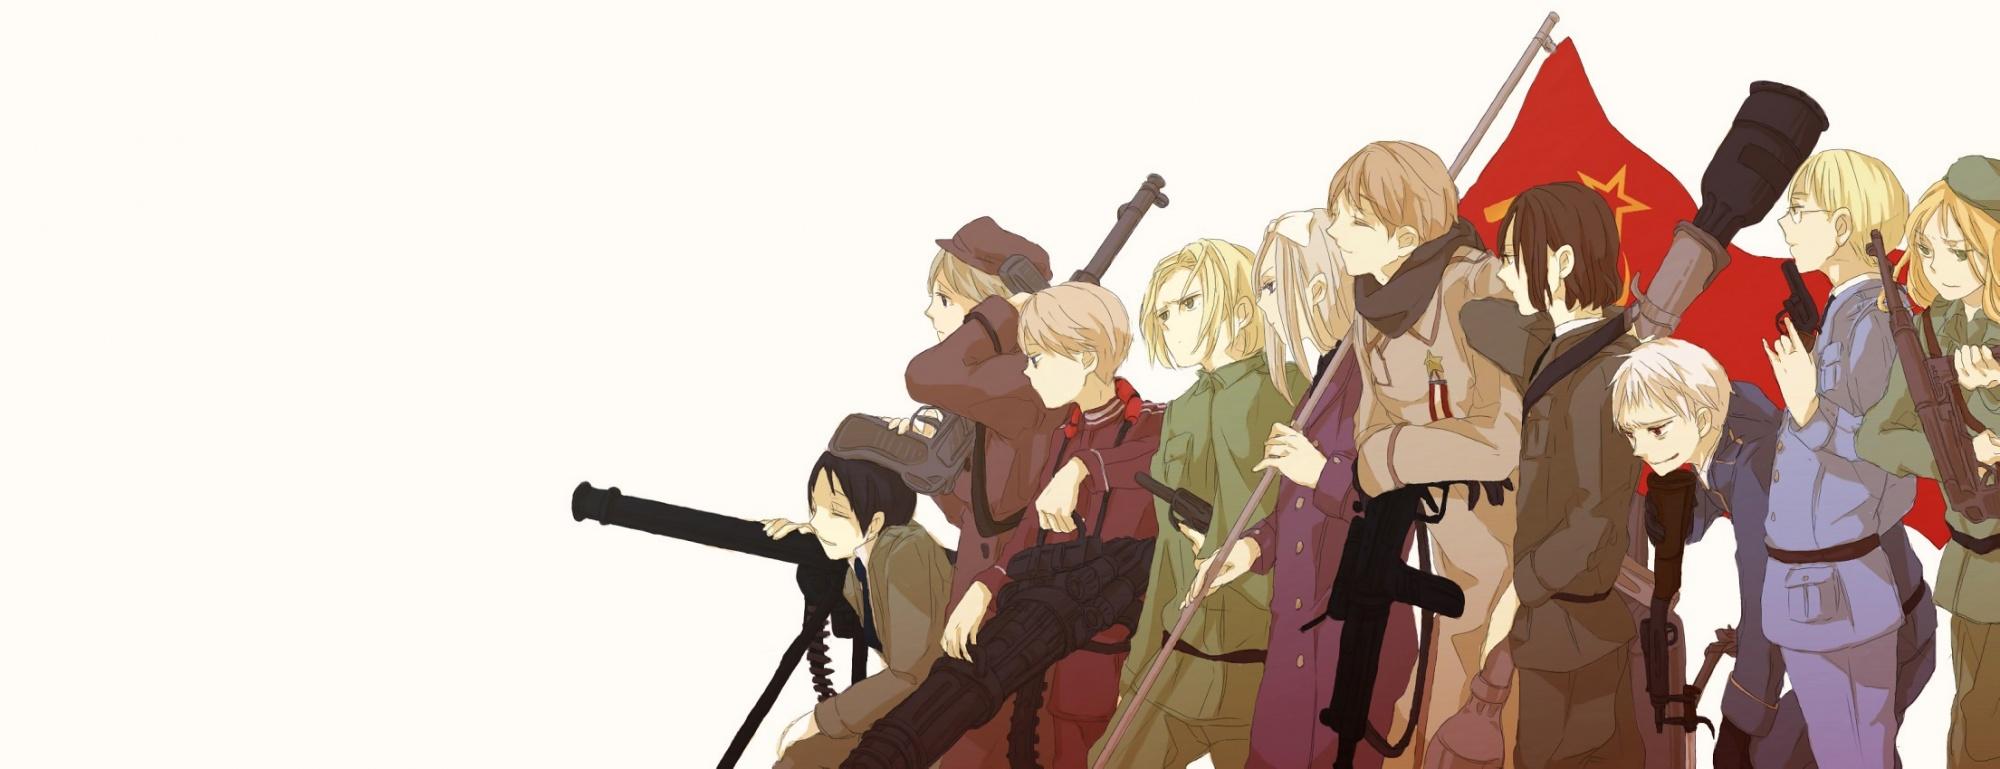 Hetalia Axis Powers My Anime Shelf